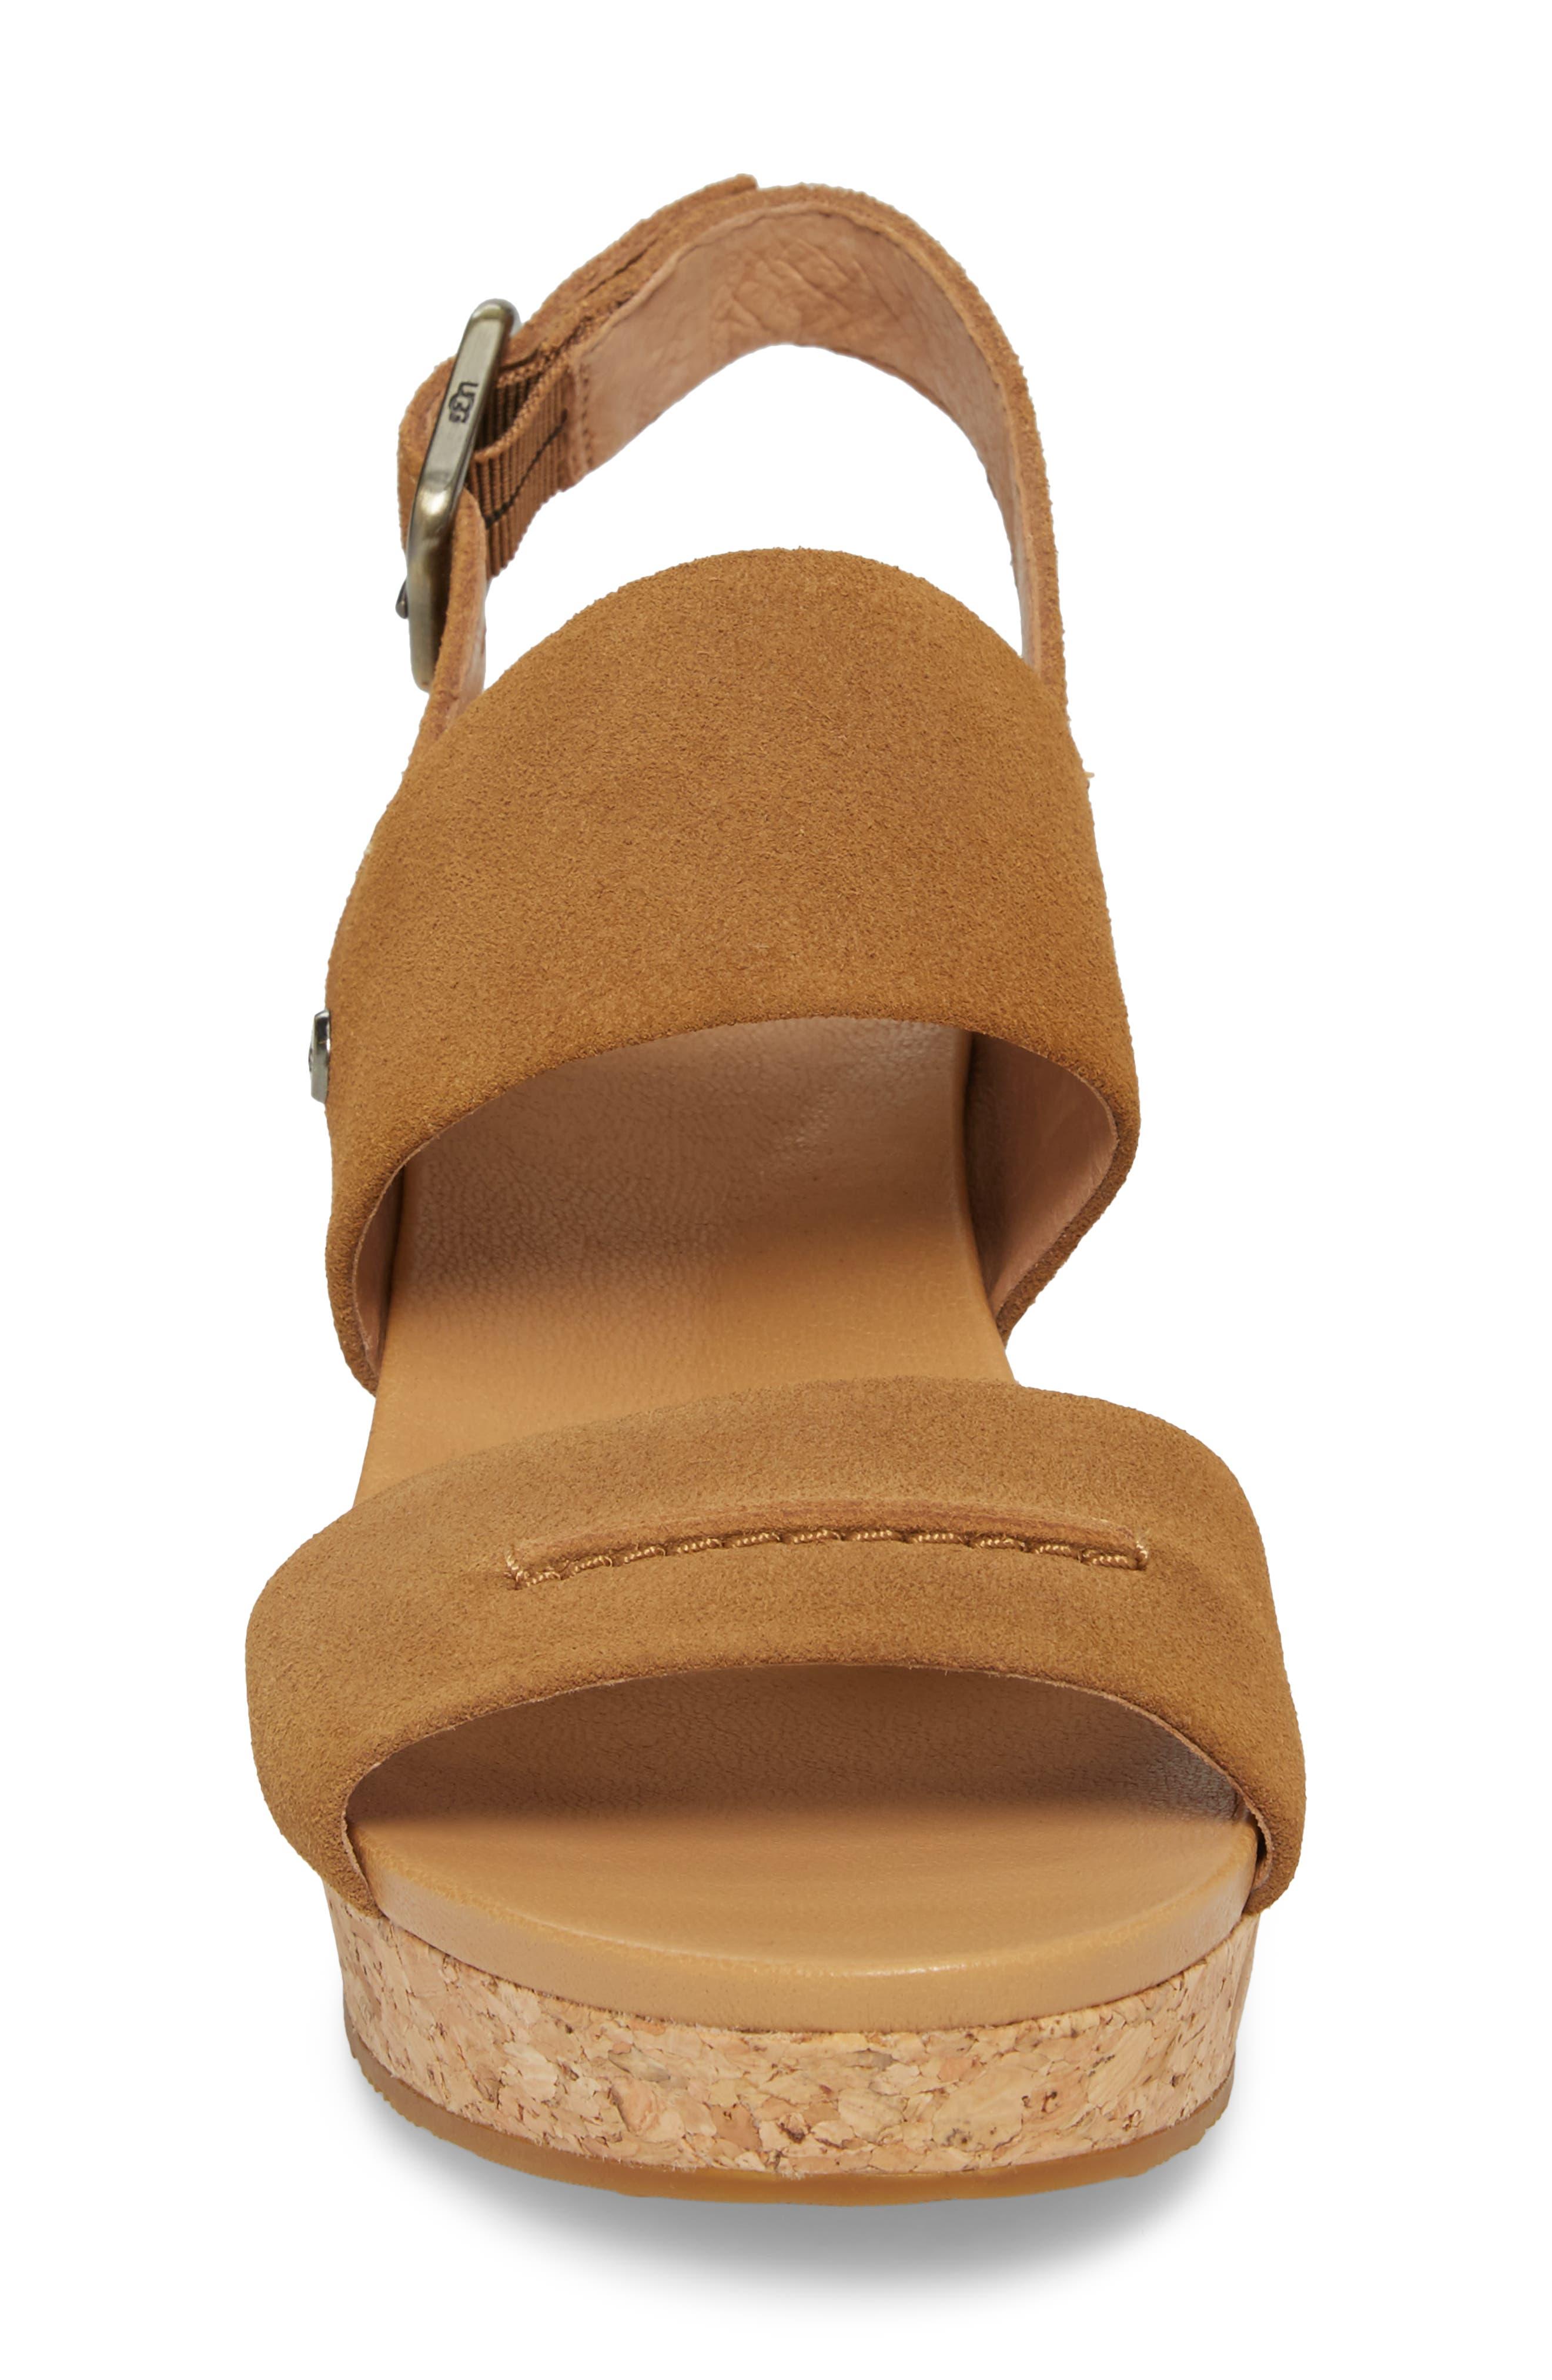 Elena II Platform Wedge Sandal,                             Alternate thumbnail 11, color,